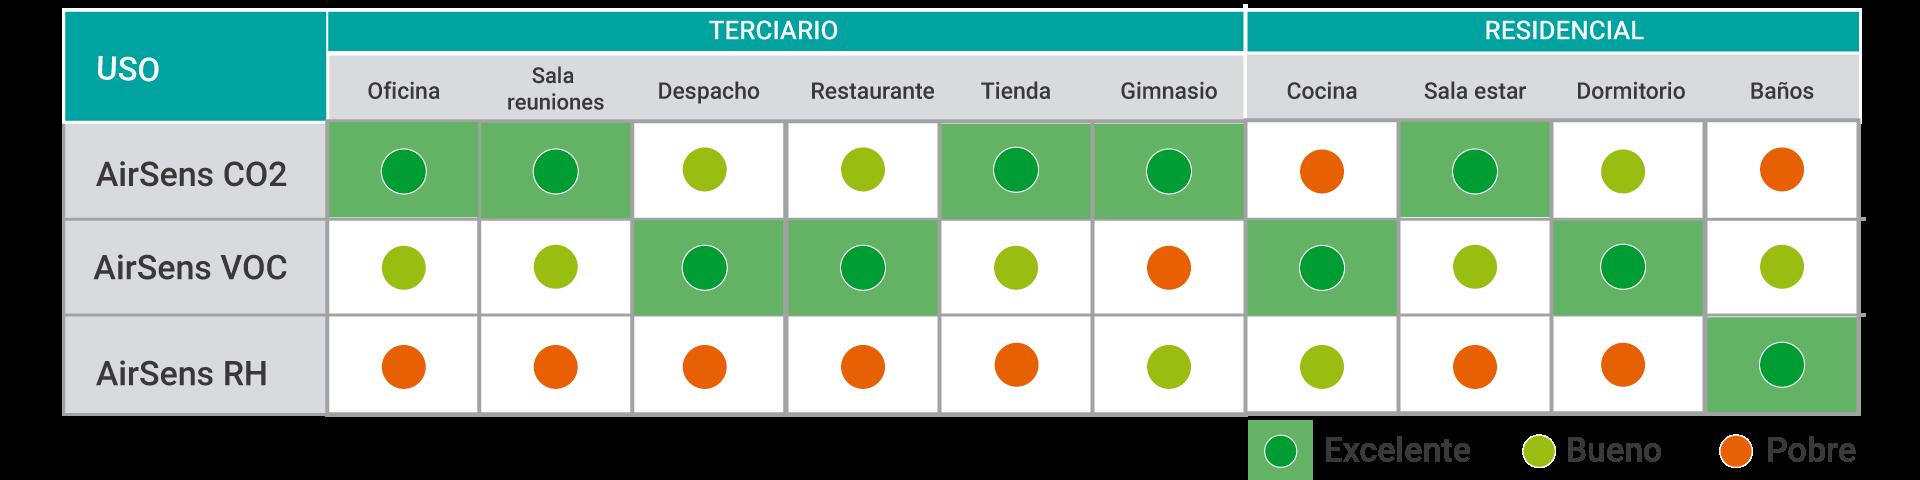 tabla-comparativa-def.png